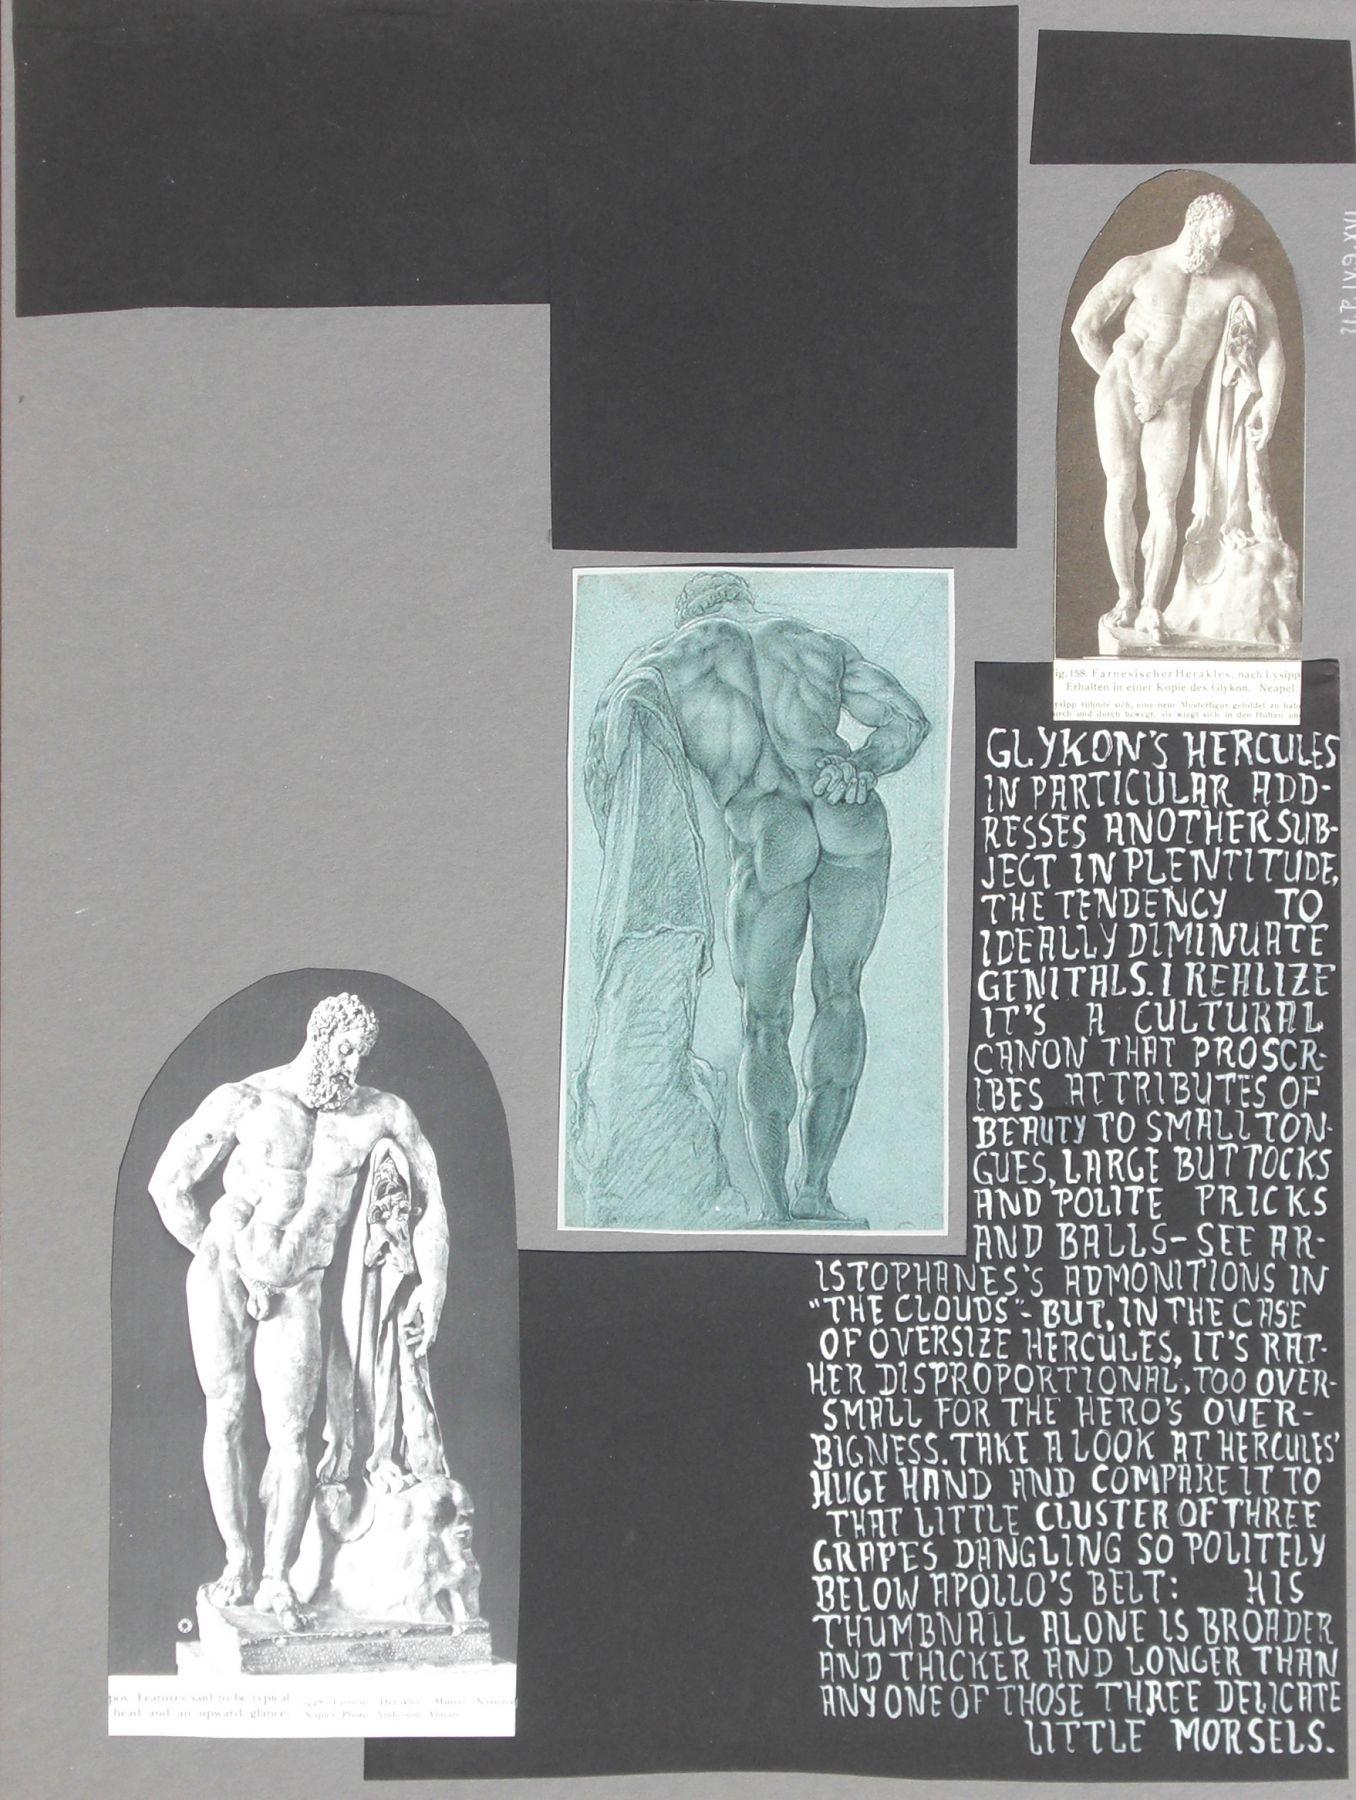 Richard Hawkins Urbis Paganus IV.9.XVI. (Hercules II), 2009 Mixed media on mat board 20 x 15 inches (50.8 x 38.1 cm)